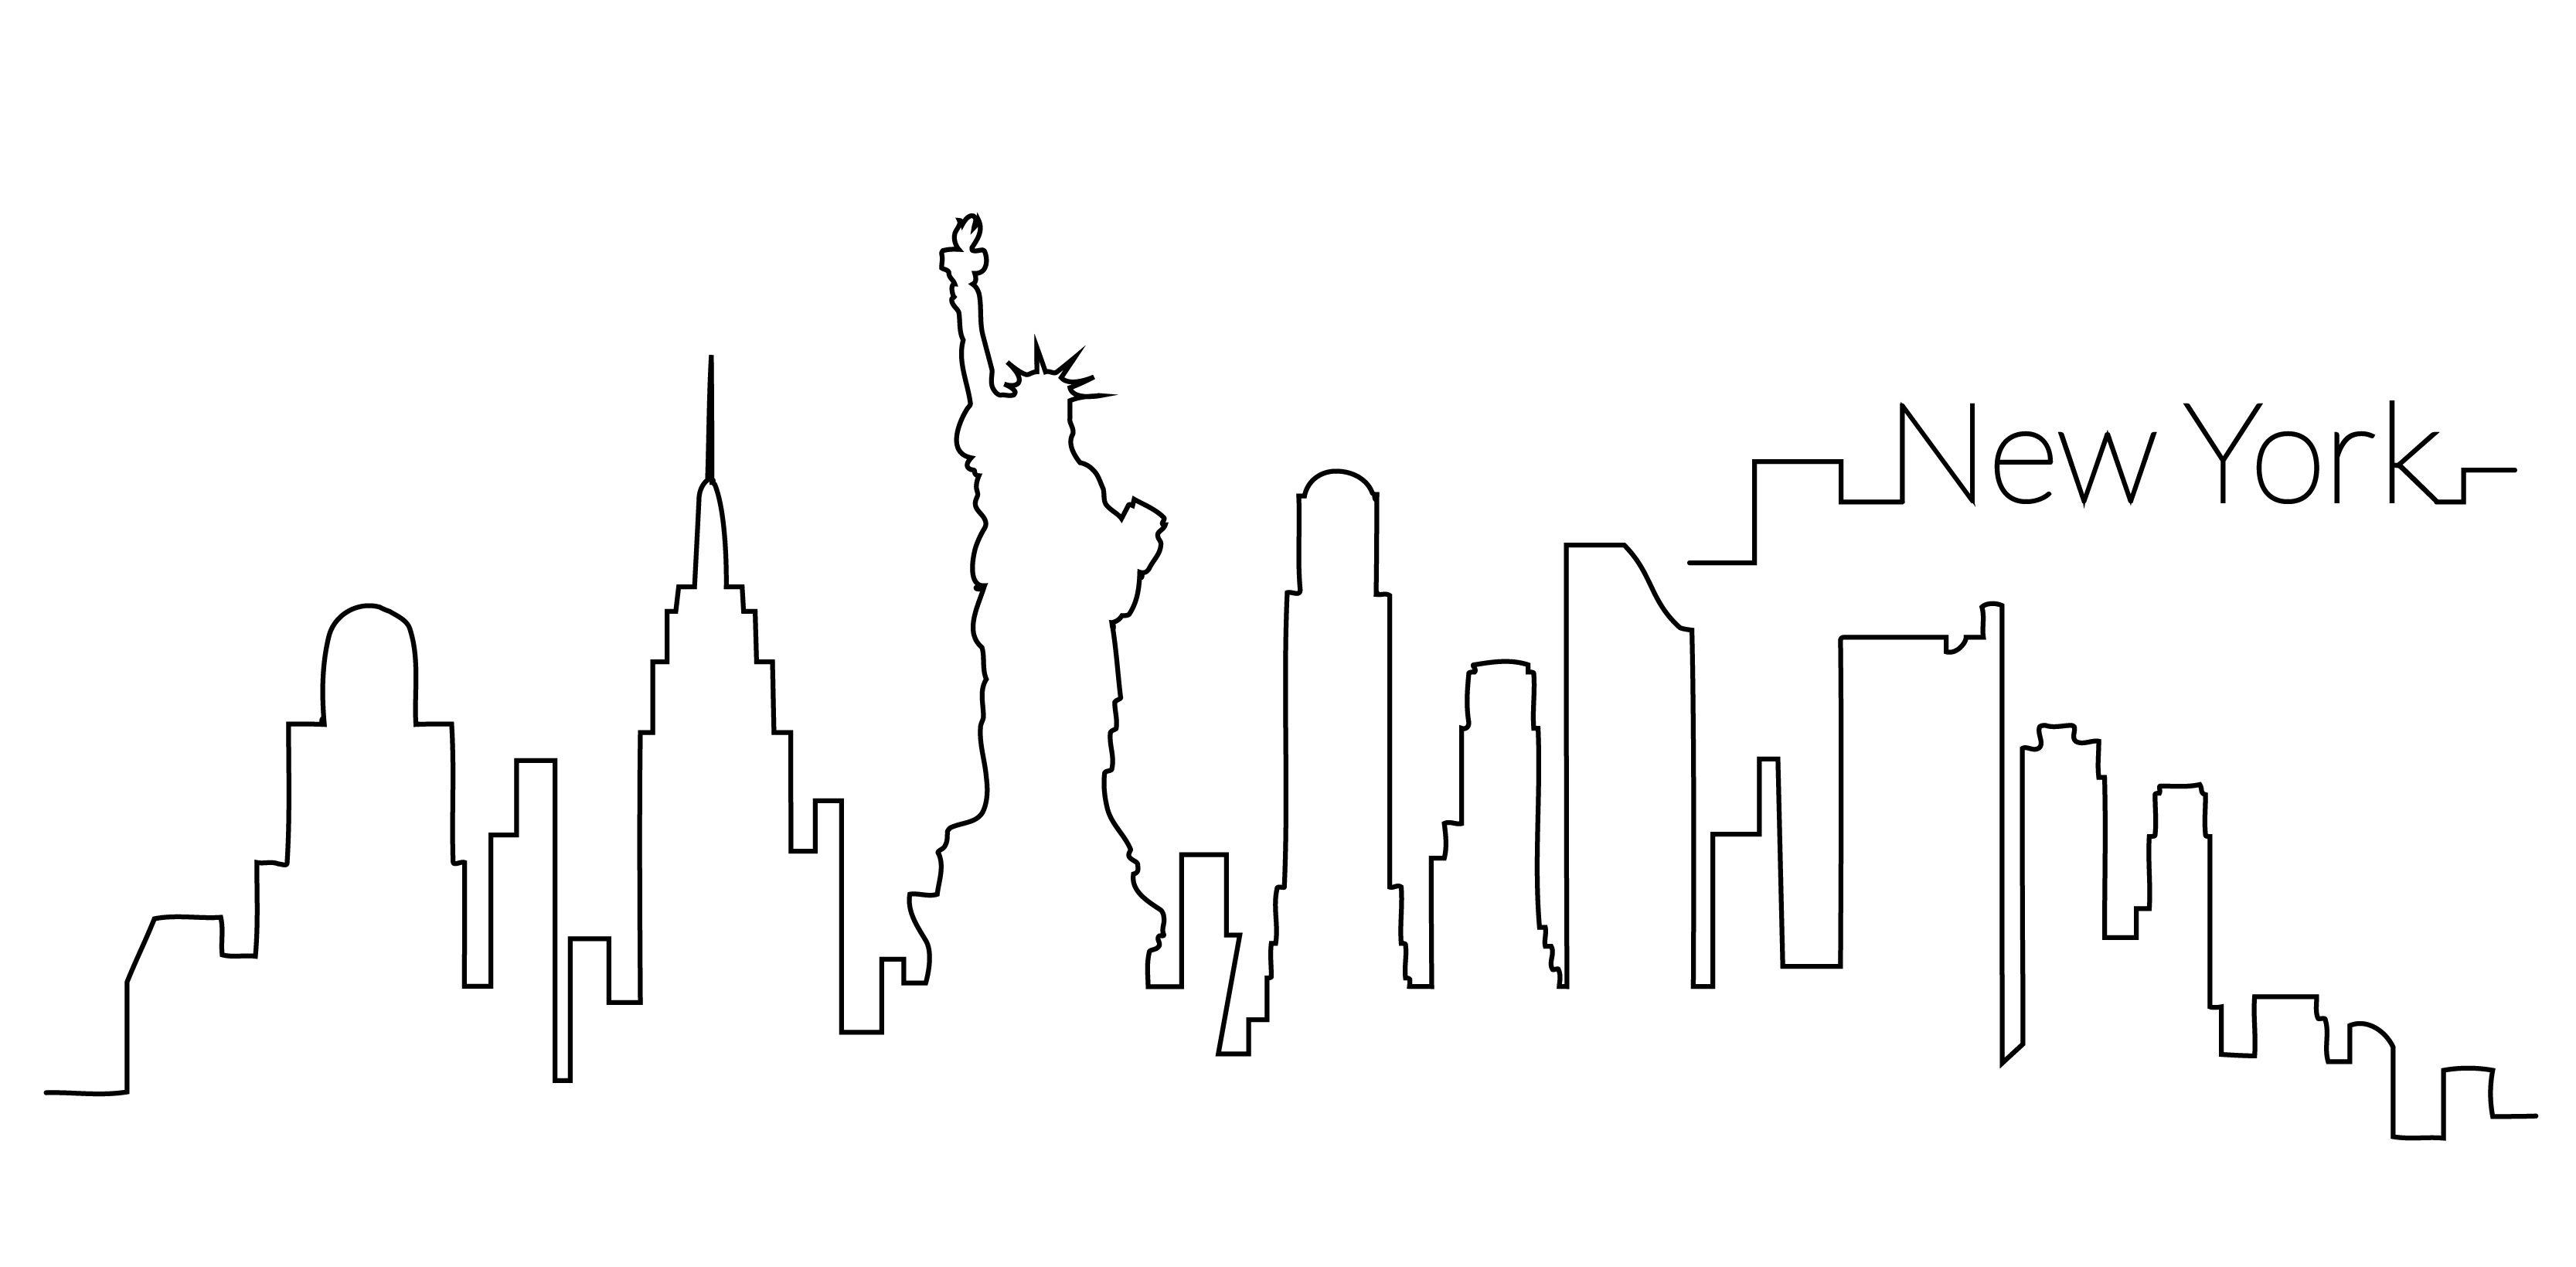 New York Skyline Outline New York Painting New York Tattoo New York Skyline Silhouette